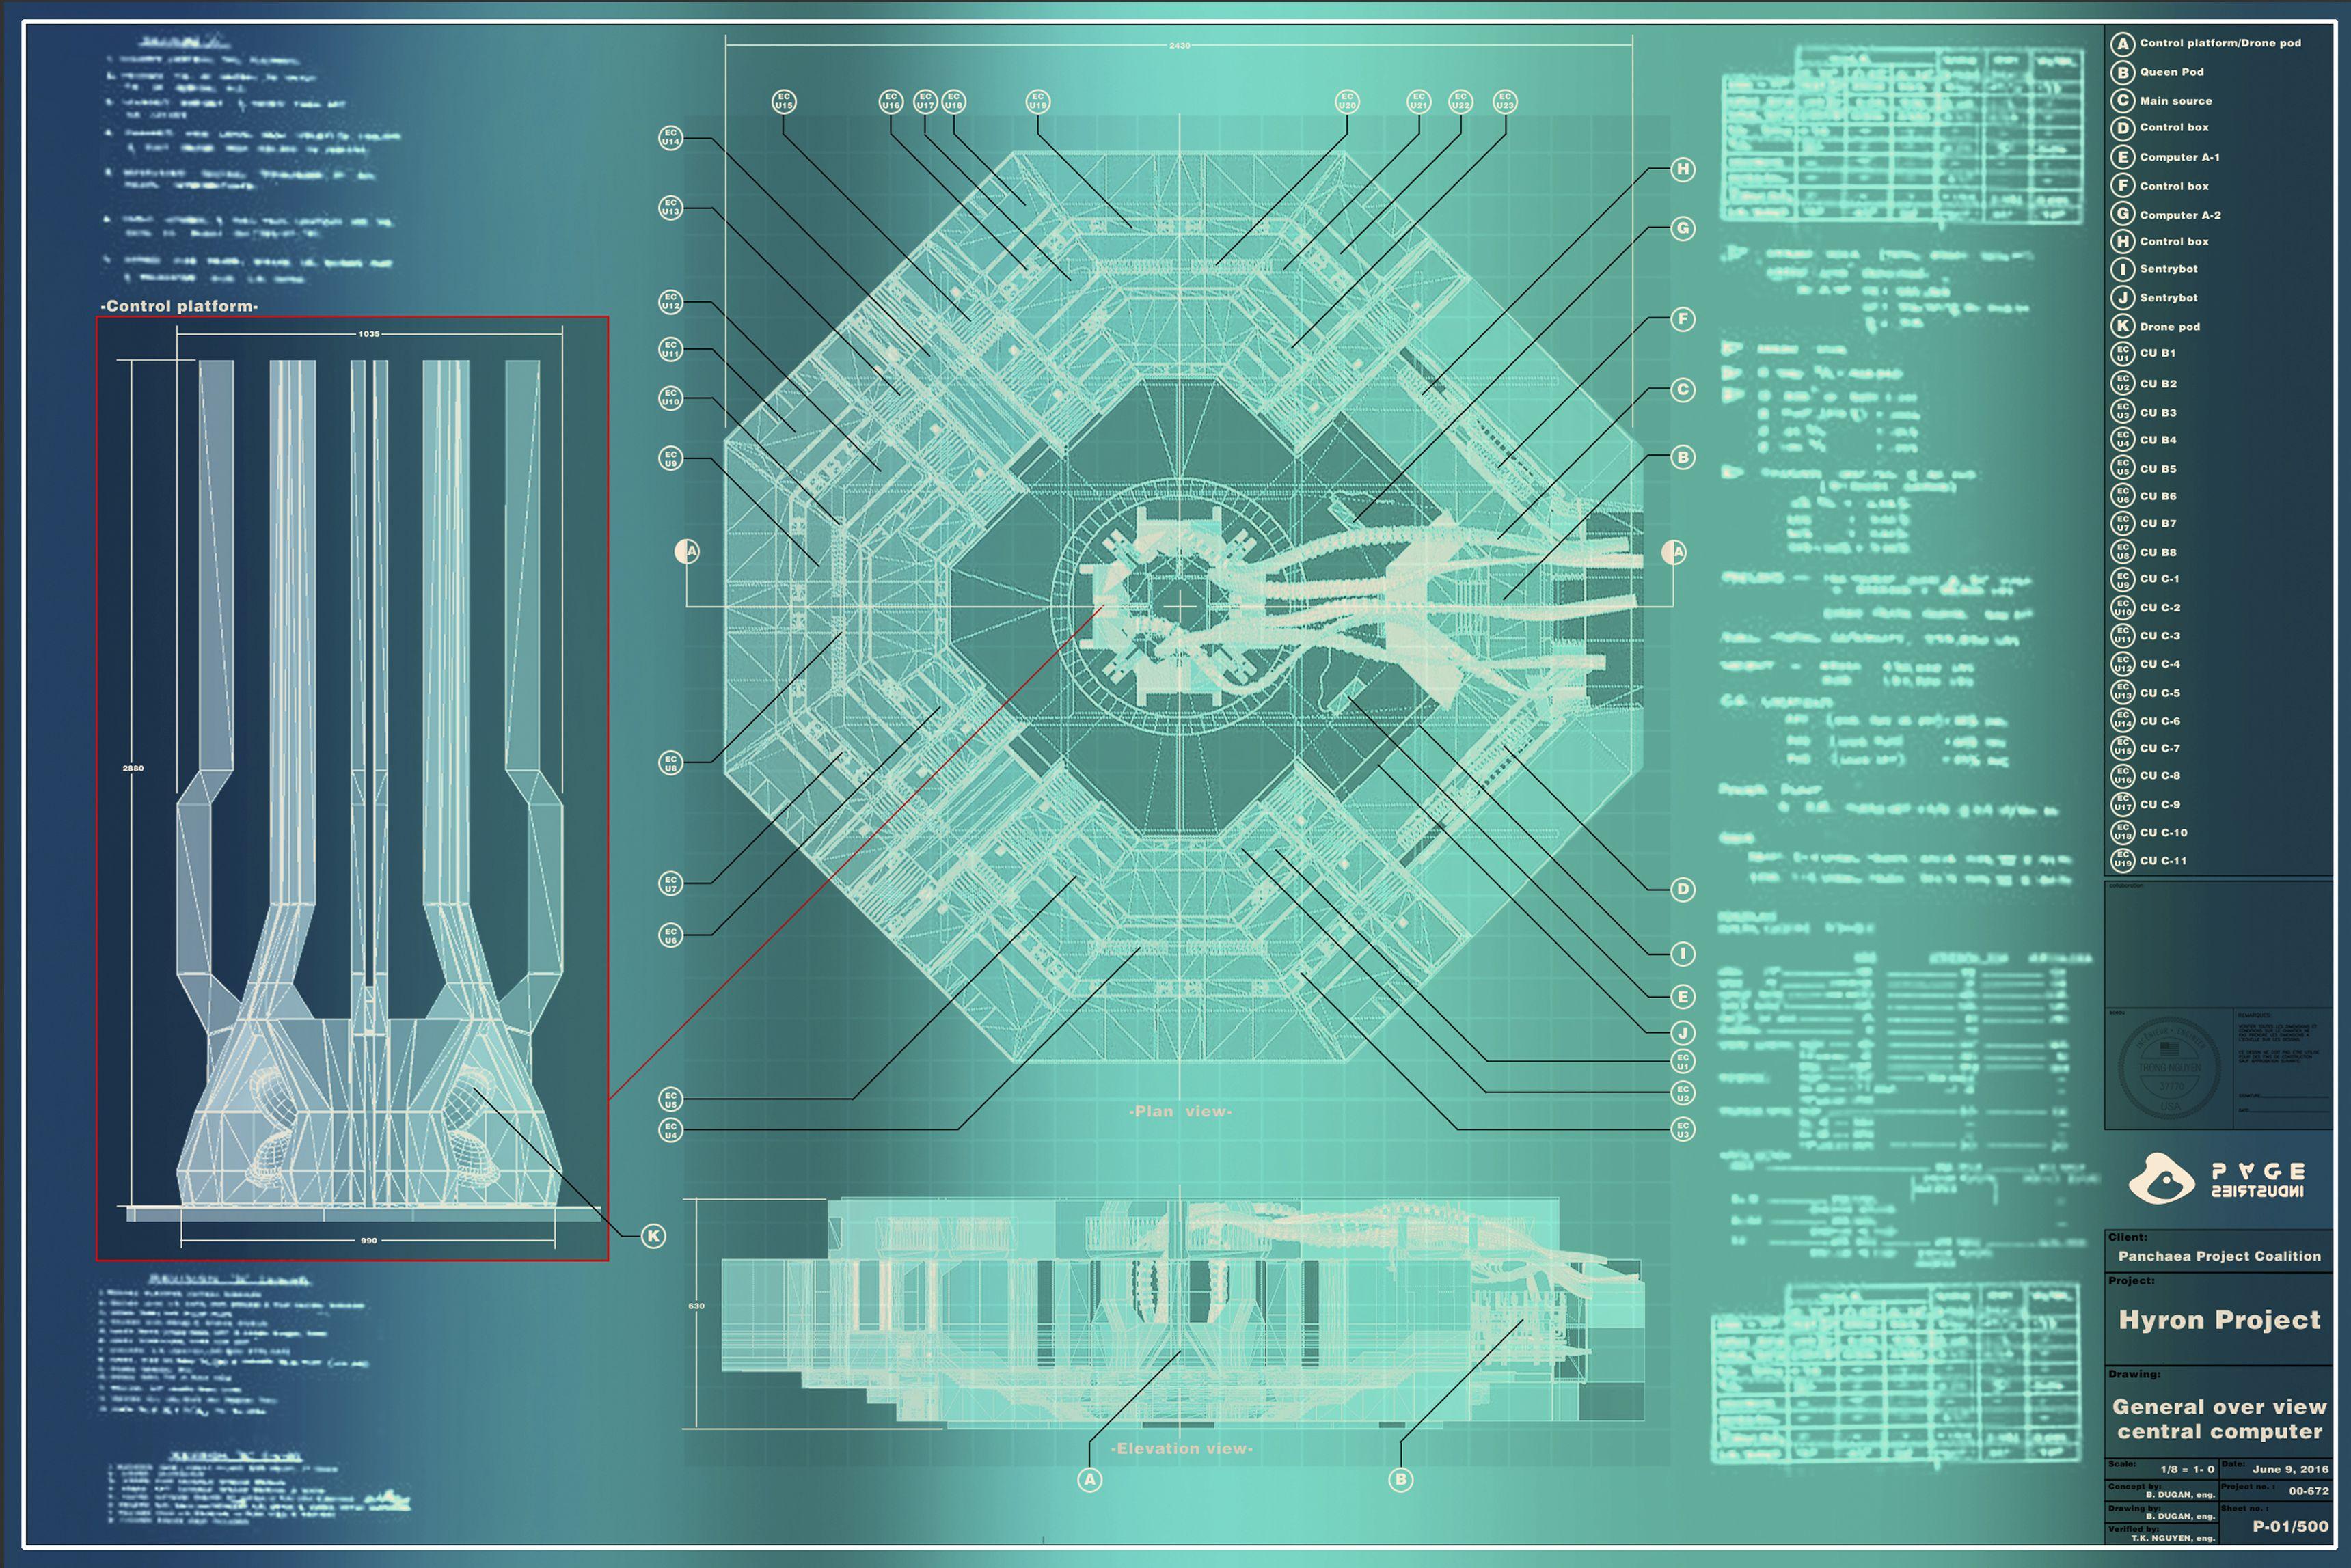 Image hyron blueprint 4g deus ex wiki fandom powered by wikia hyron blueprint 4g malvernweather Choice Image